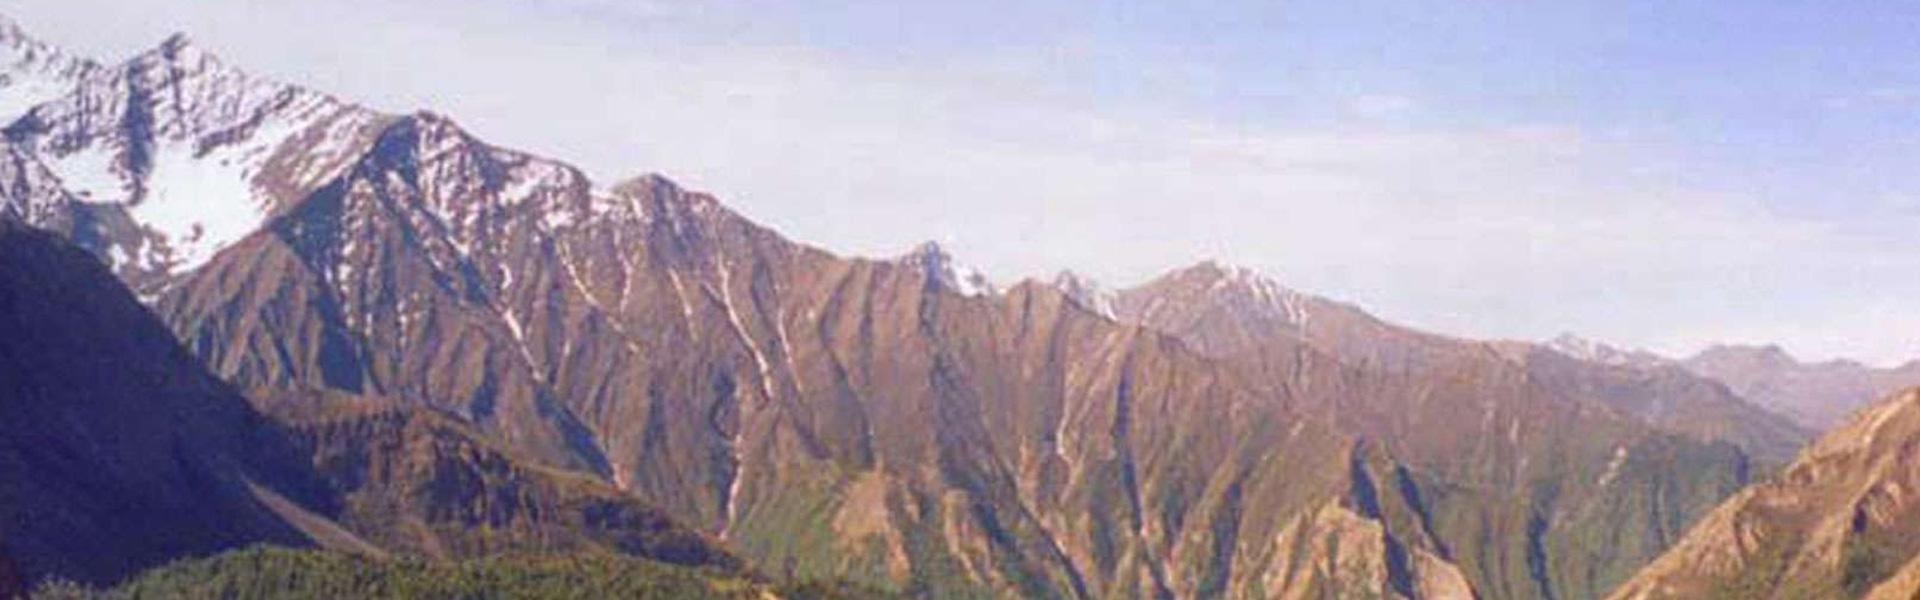 Upper Dolpo Trek Itinerary and Cost